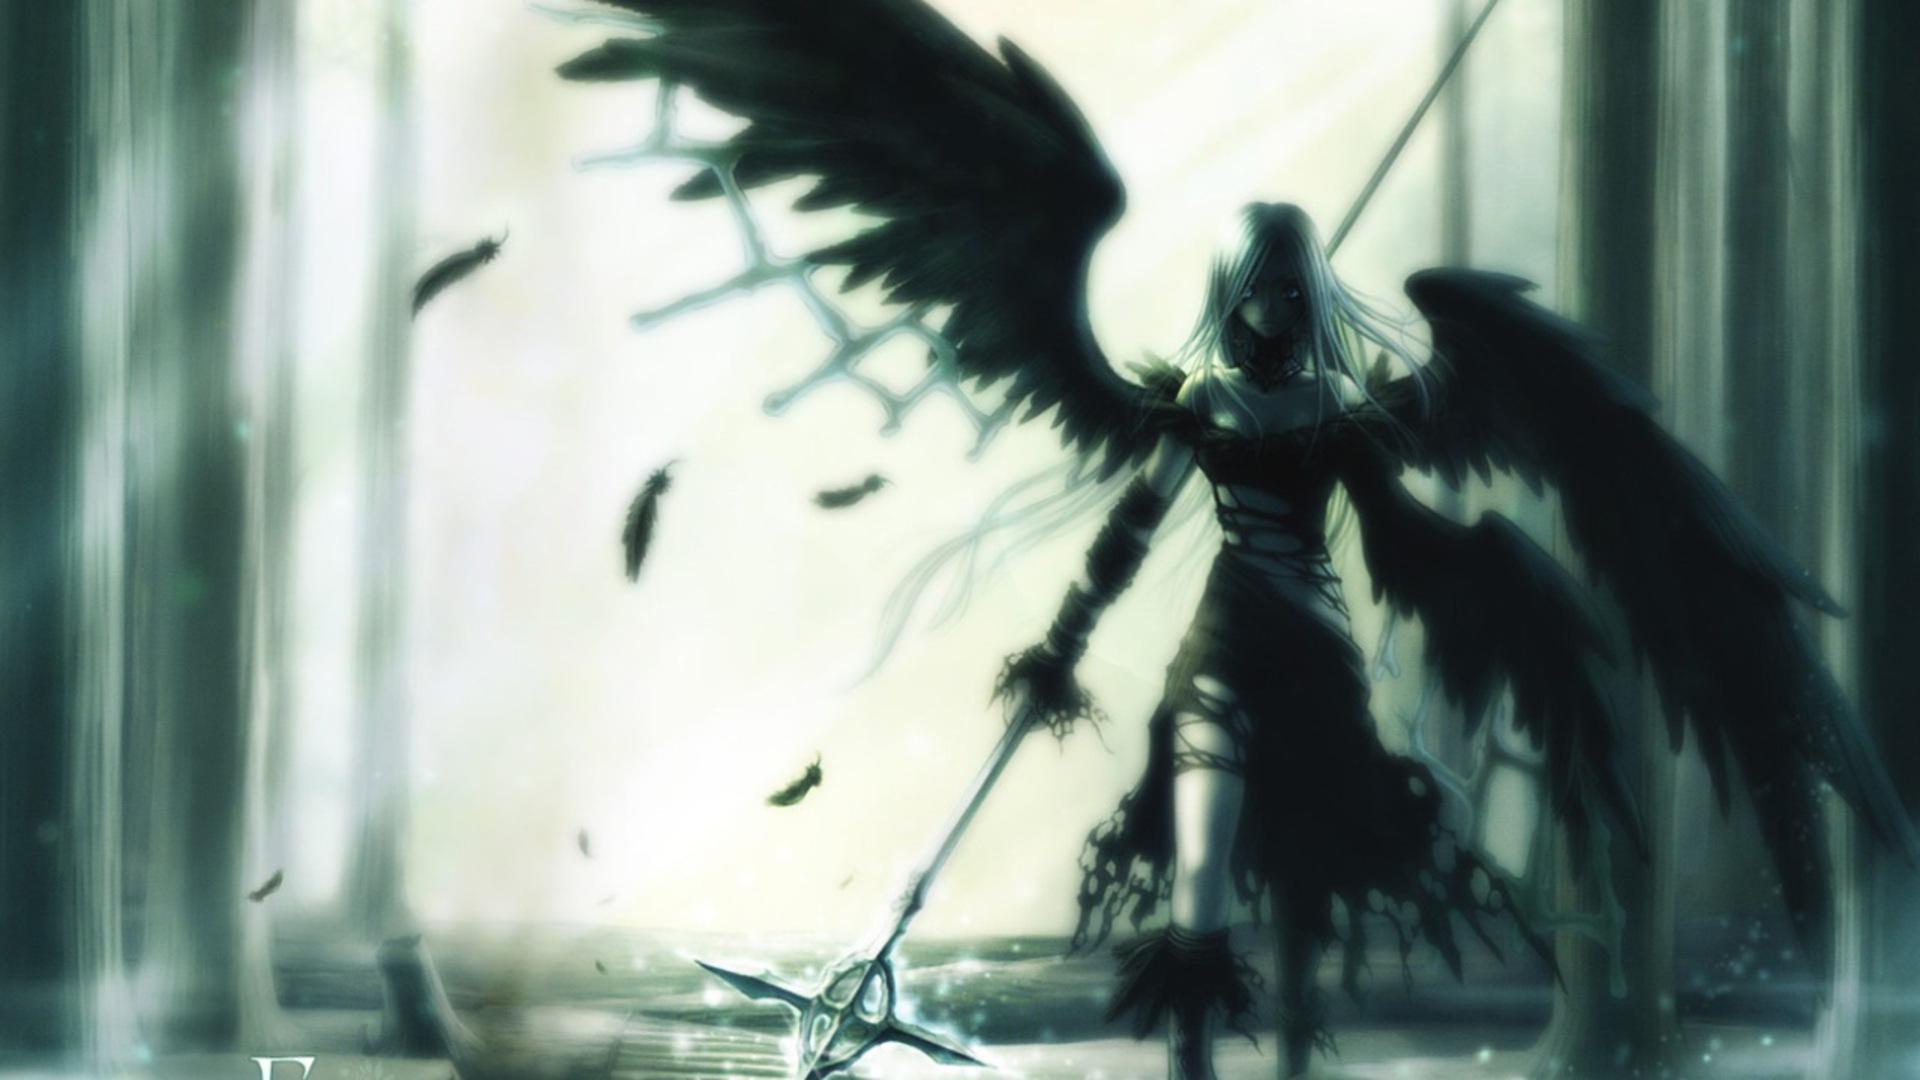 Wings Anime Wallpaper 1920x1080 Wings Anime Girls 1920x1080